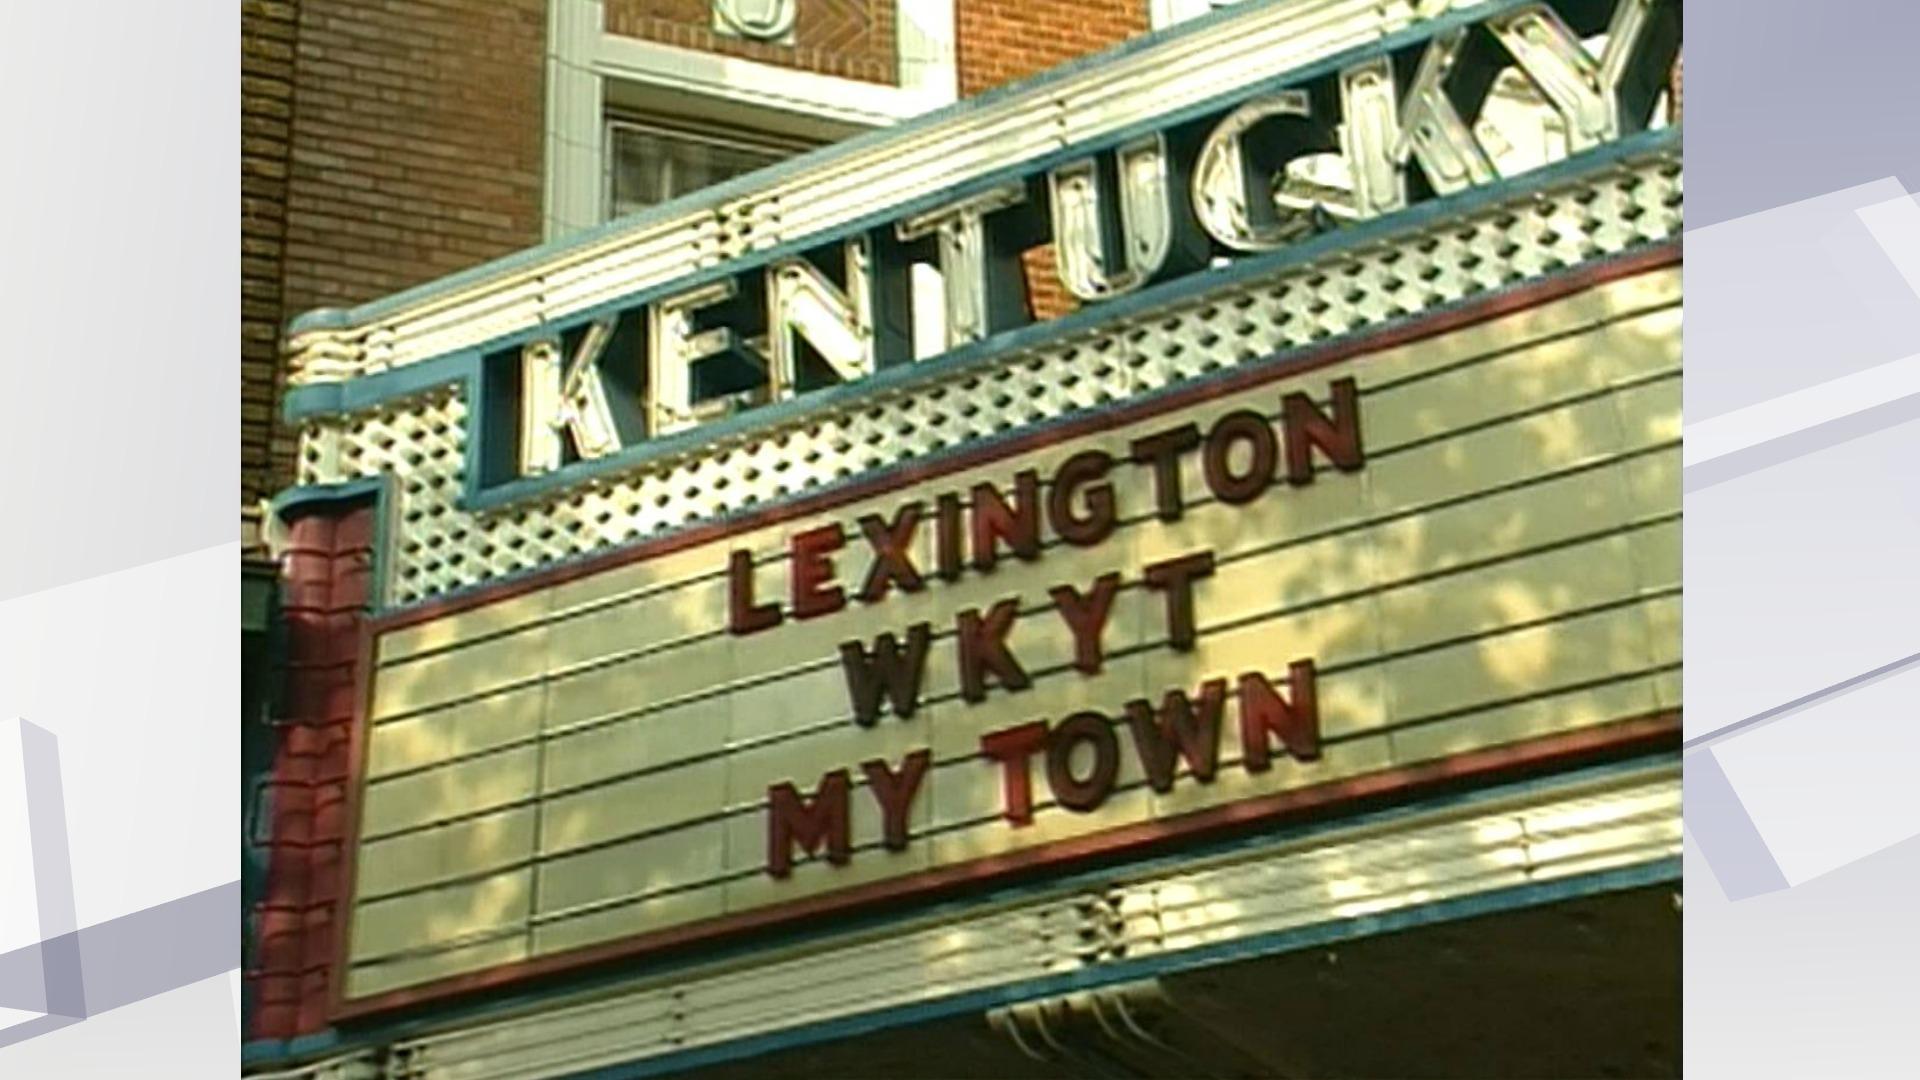 Lexington Miranda Combs Wkyt Snogo Wwwtollebildcom